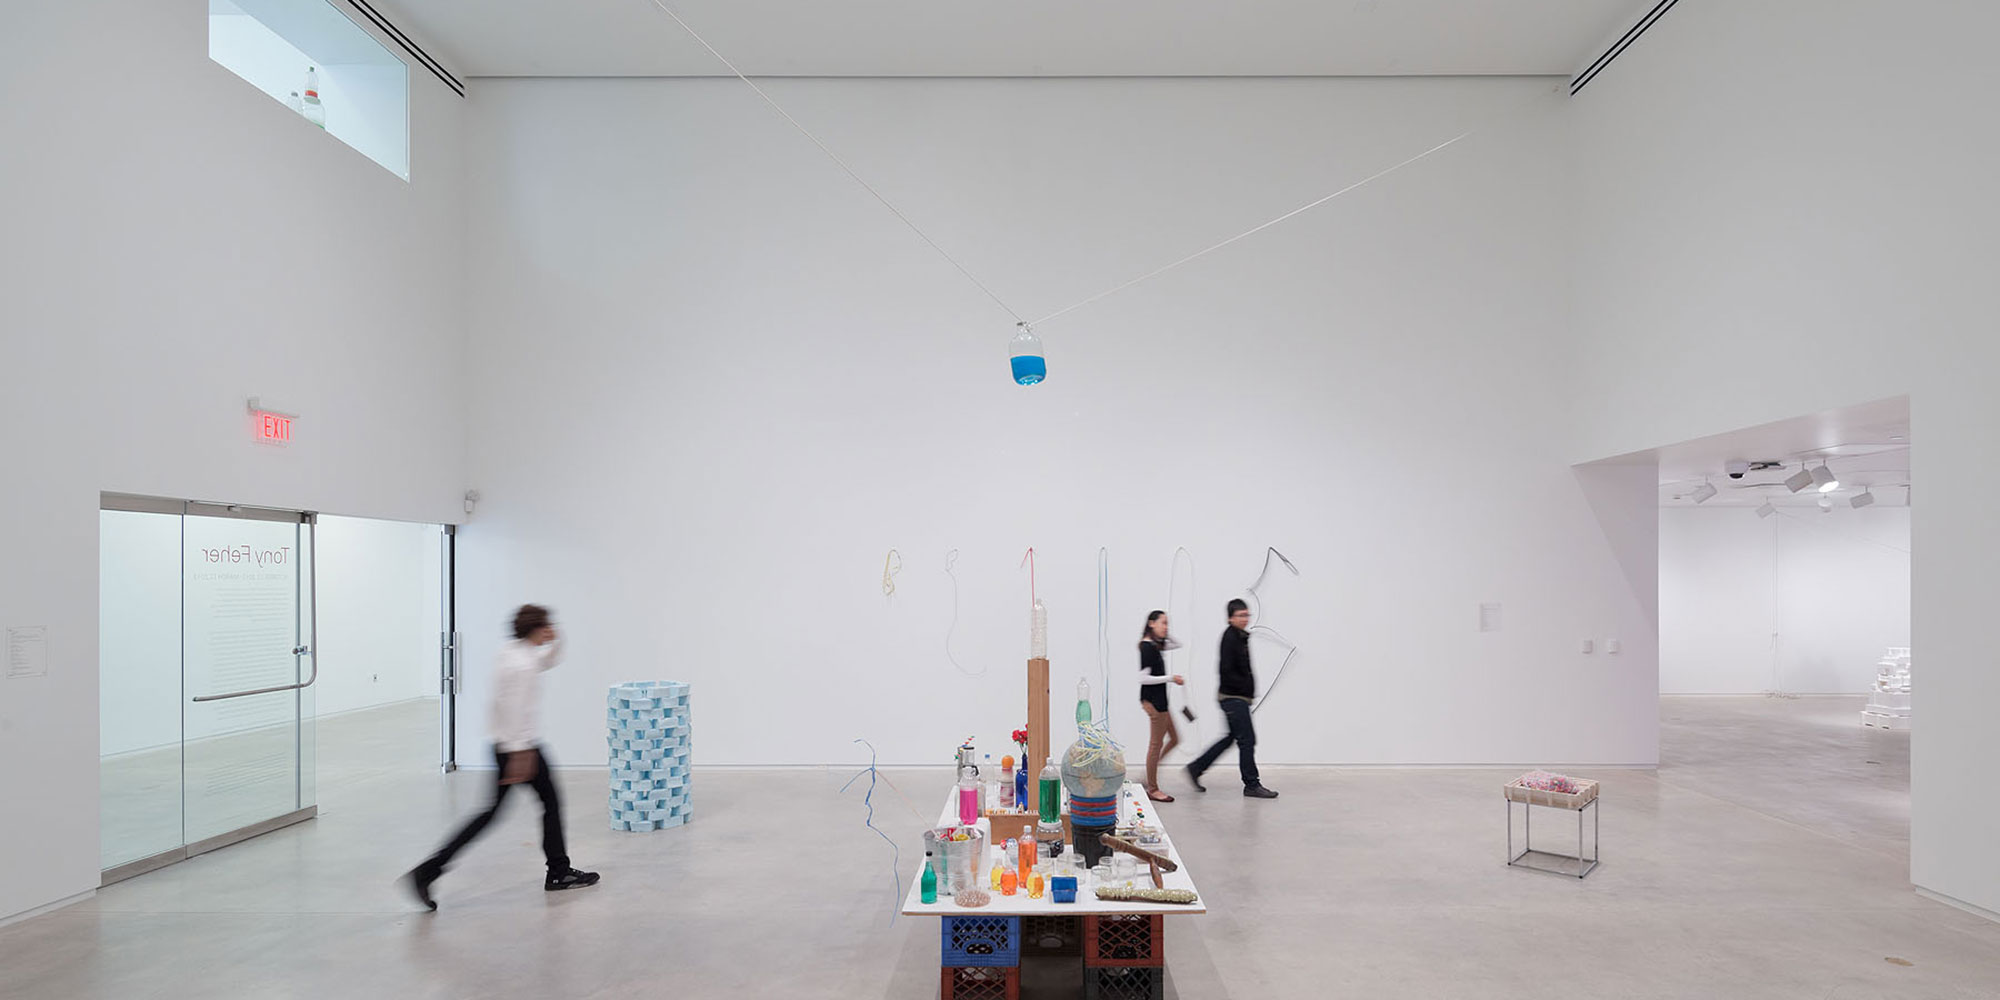 Blaffer Art Museum Gallery